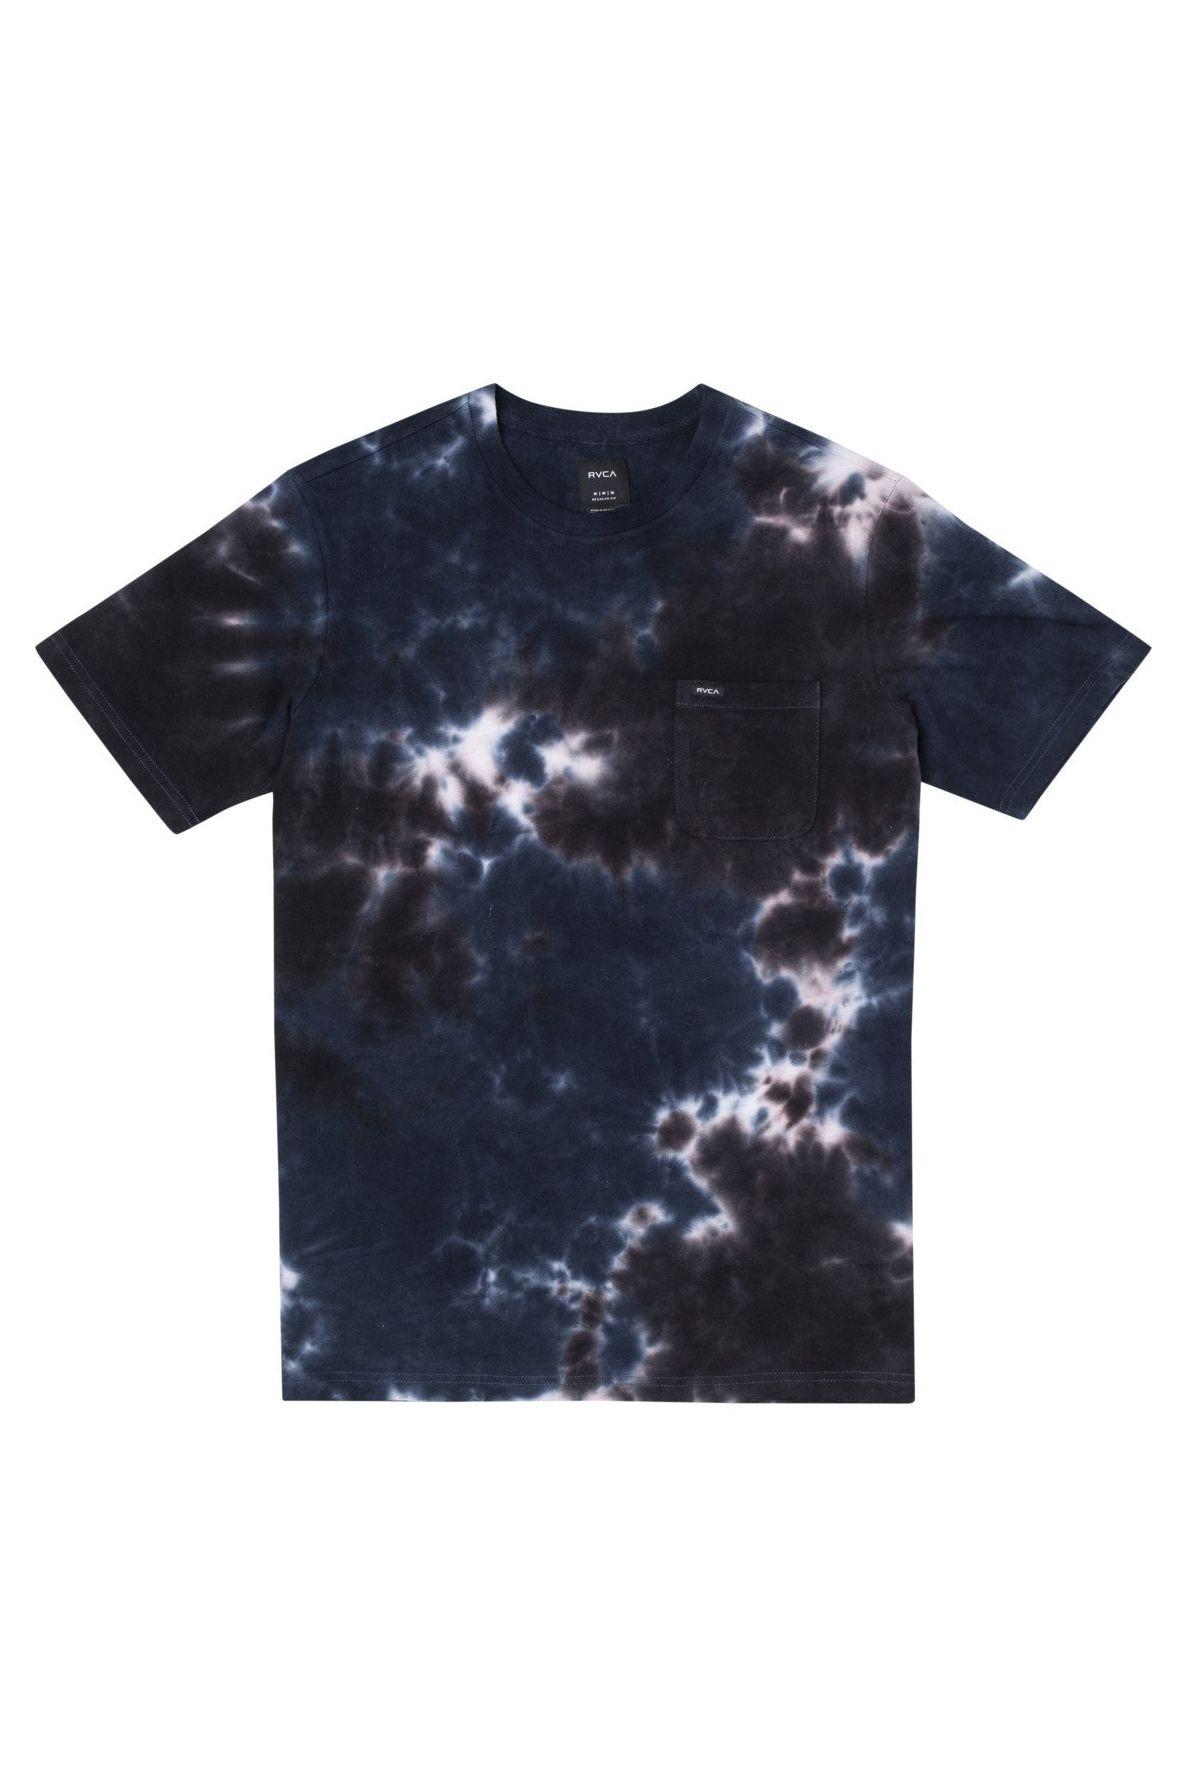 RVCA T-Shirt MANIC TIE DYE CREW Navy Tie Dye